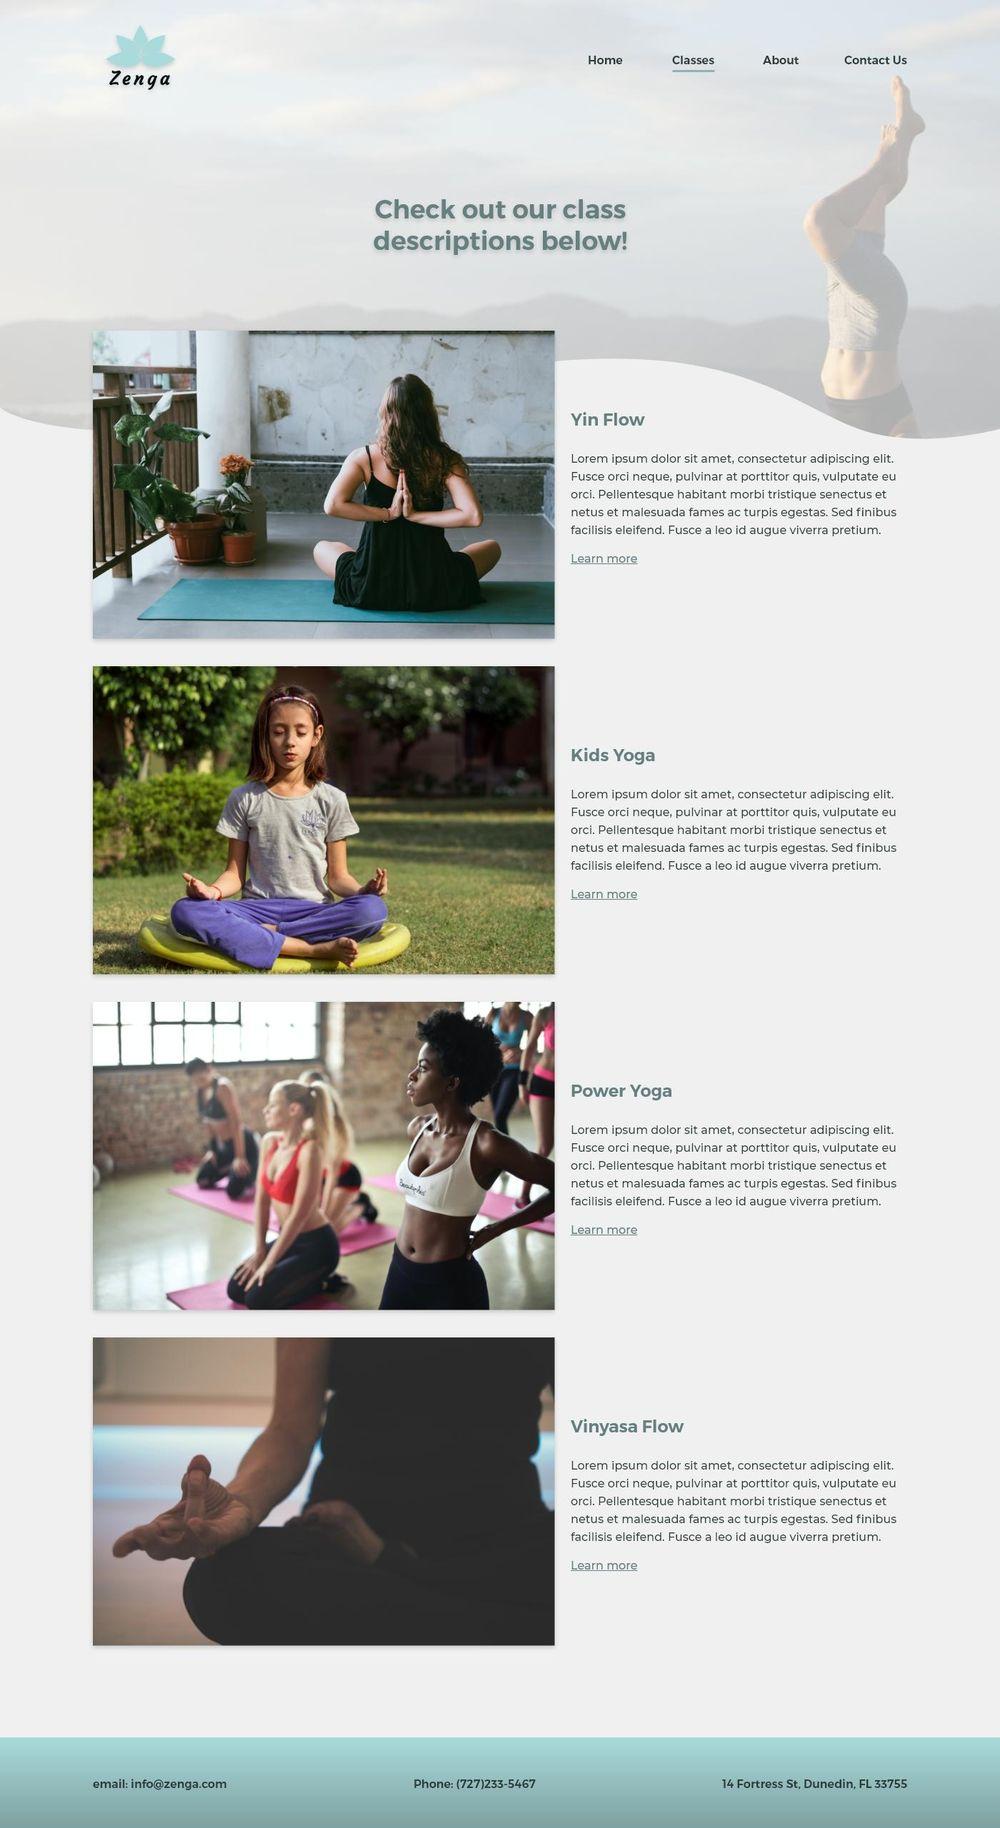 Yoga Studio Website Design - image 3 - student project